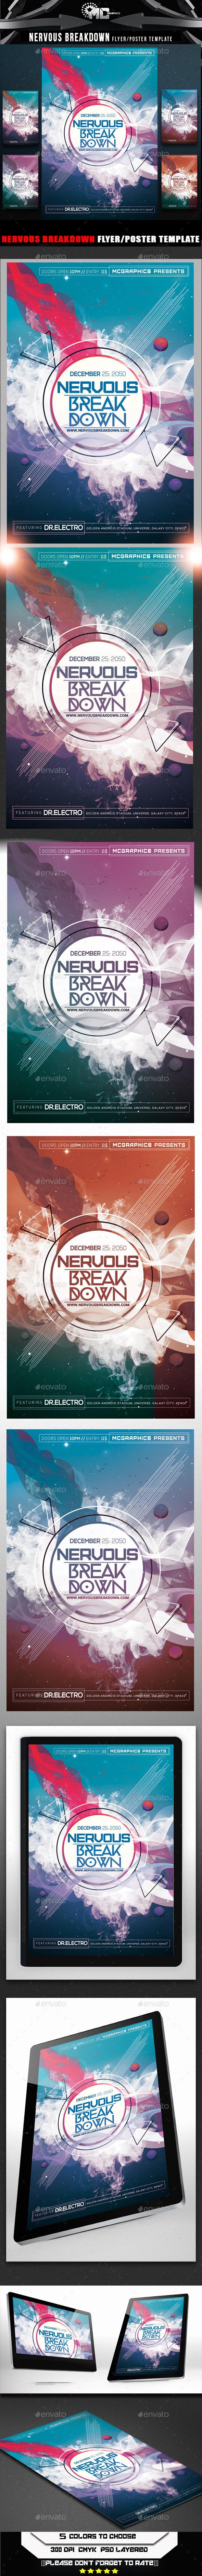 Nervous Break Down Flyer Template - Clubs & Parties Events